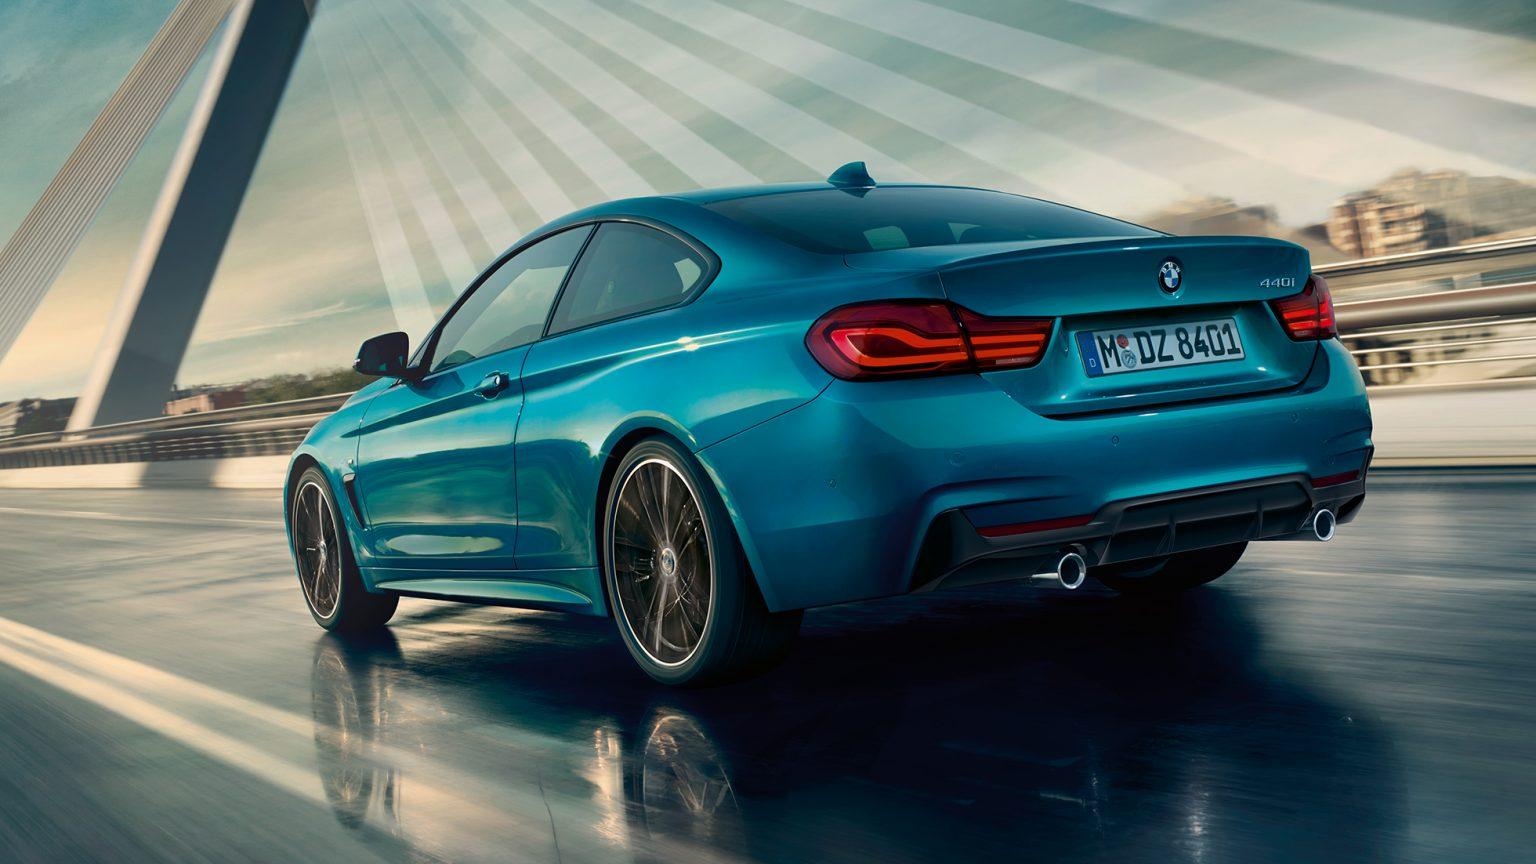 bmw-4-series-coupe-inspire-mg-exterior-interior-design-desktop-03